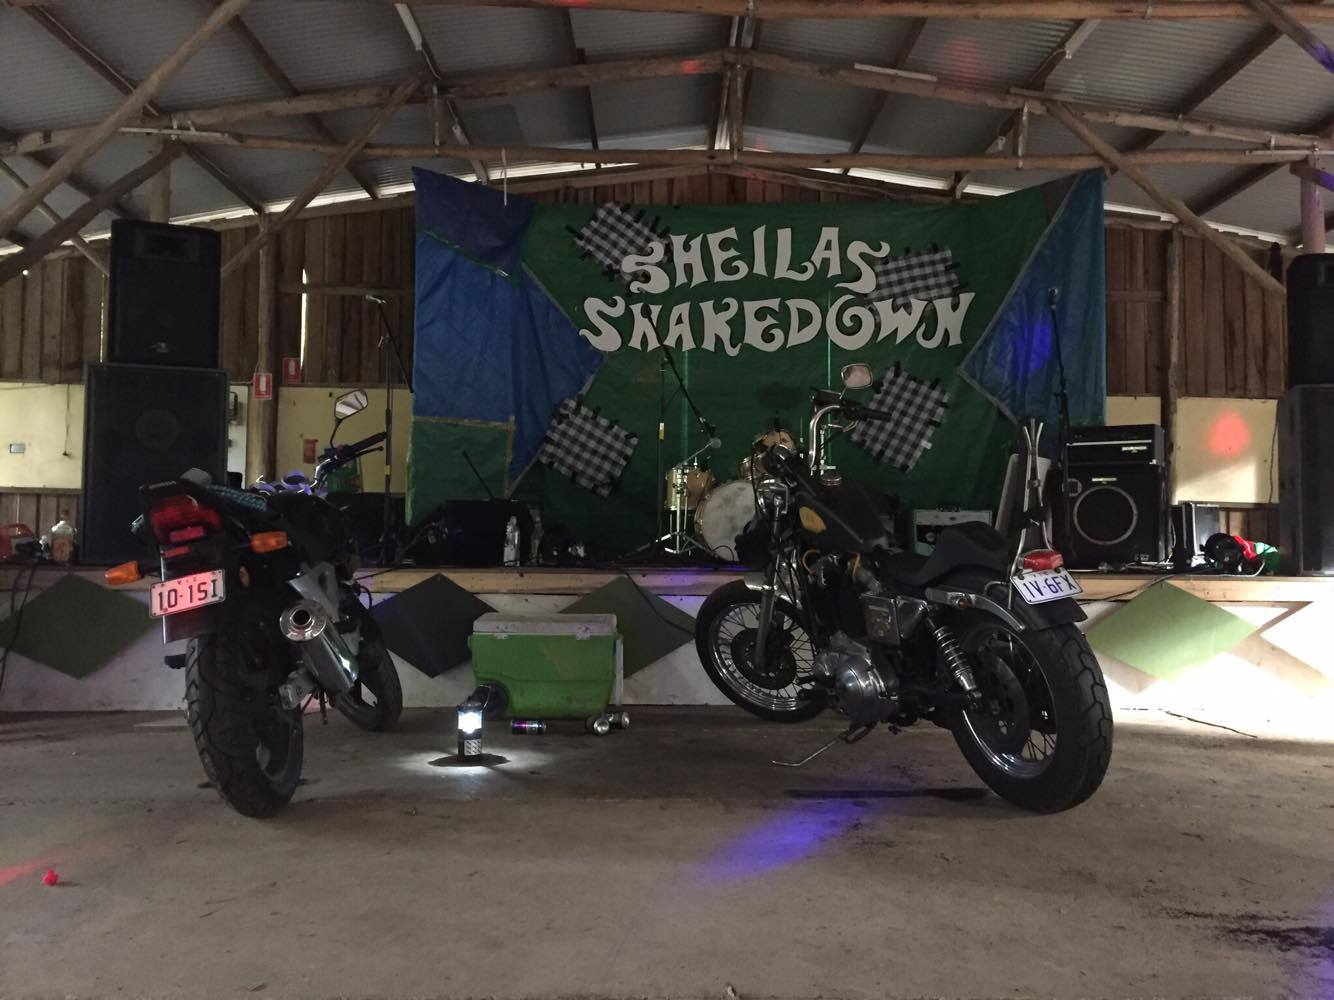 SHEILAS SHAKEDOWN